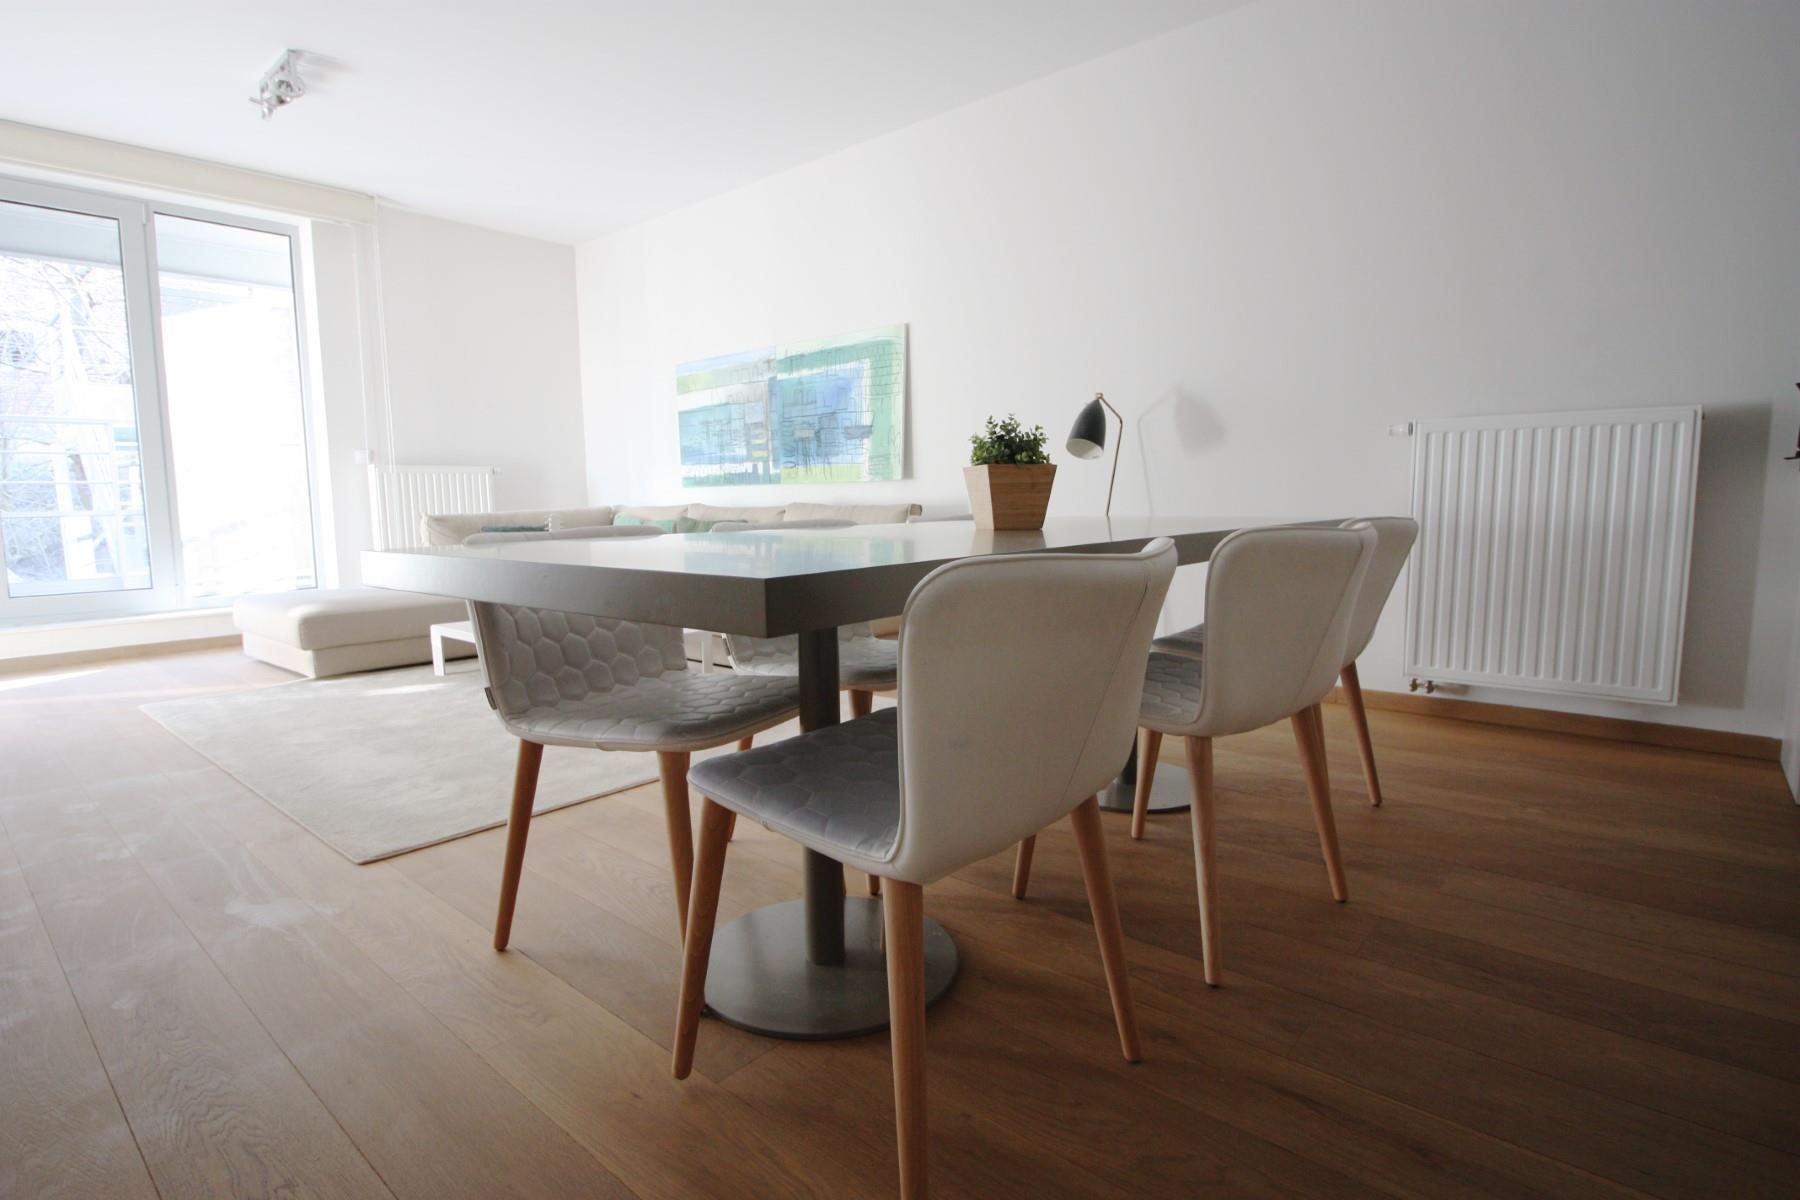 Flat - Etterbeek - #4527457-9